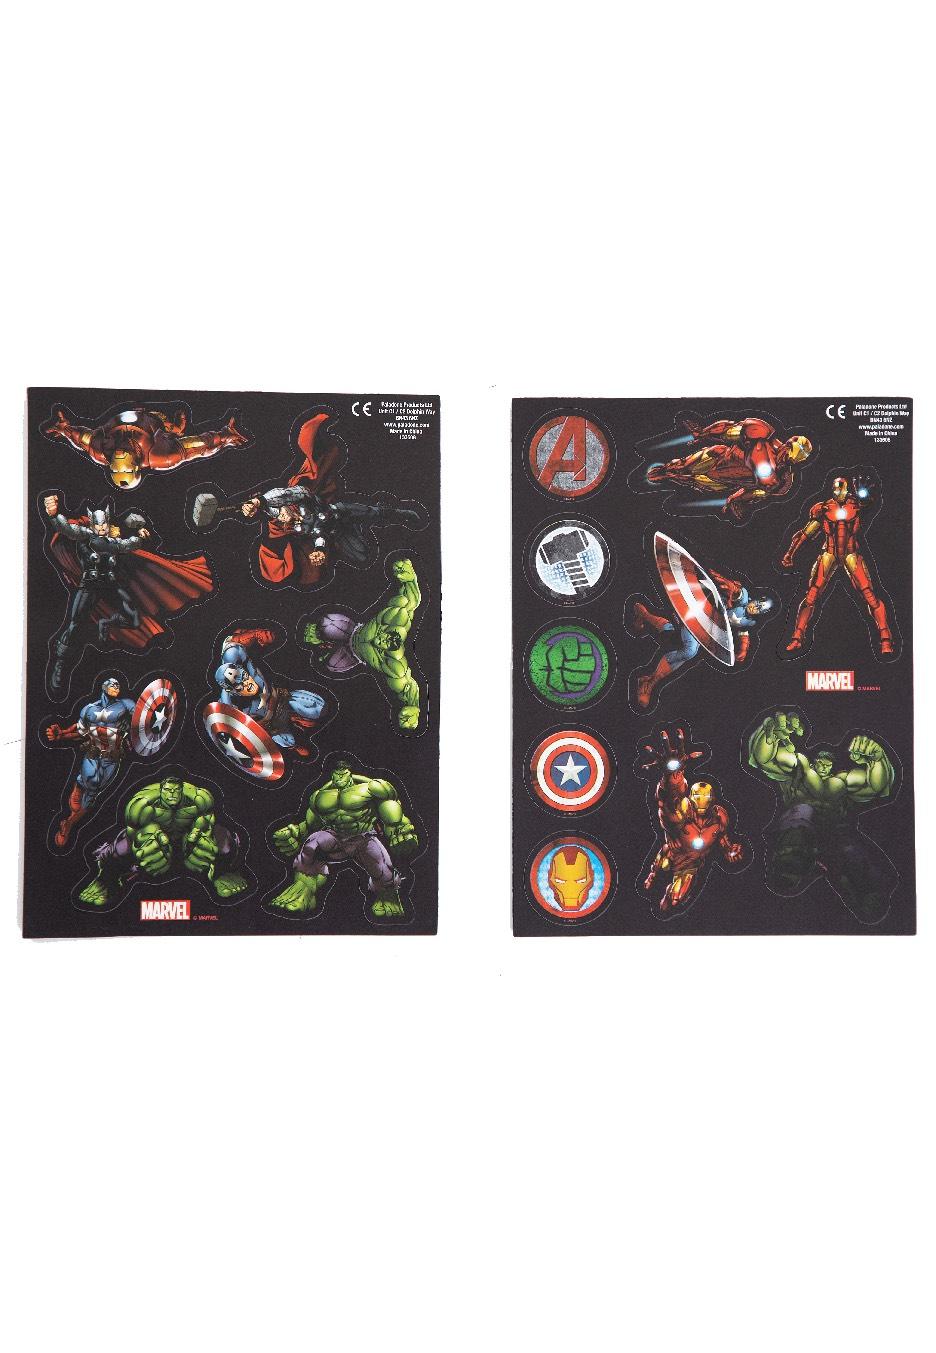 Marvel Comics - Avengers Fridge - Fridge Magnet - Impericon.com Worldwide 4f25d2feb20f